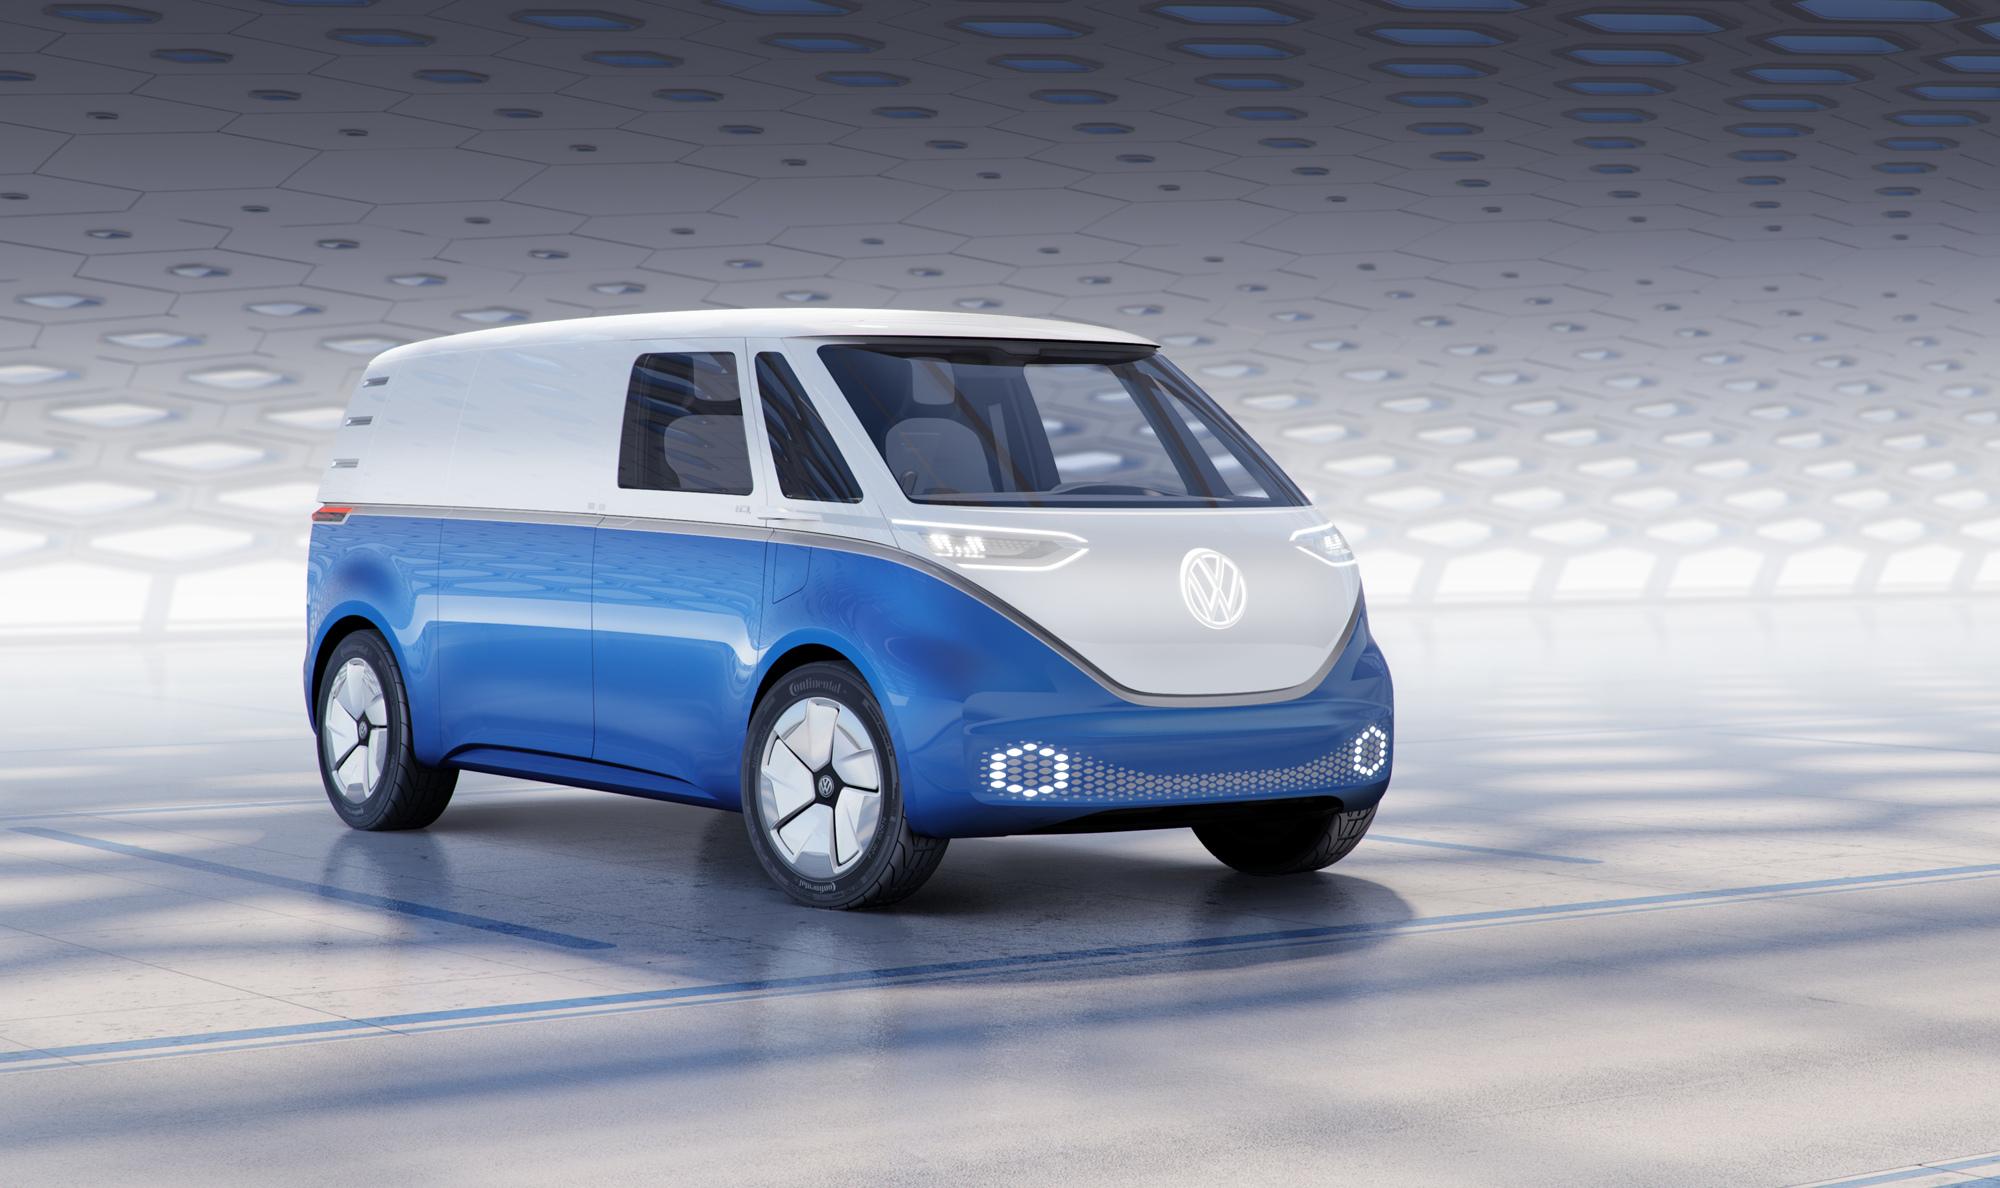 Семейство электрокаров Volkswagen I.D. дополнил фургон Buzz Cargo